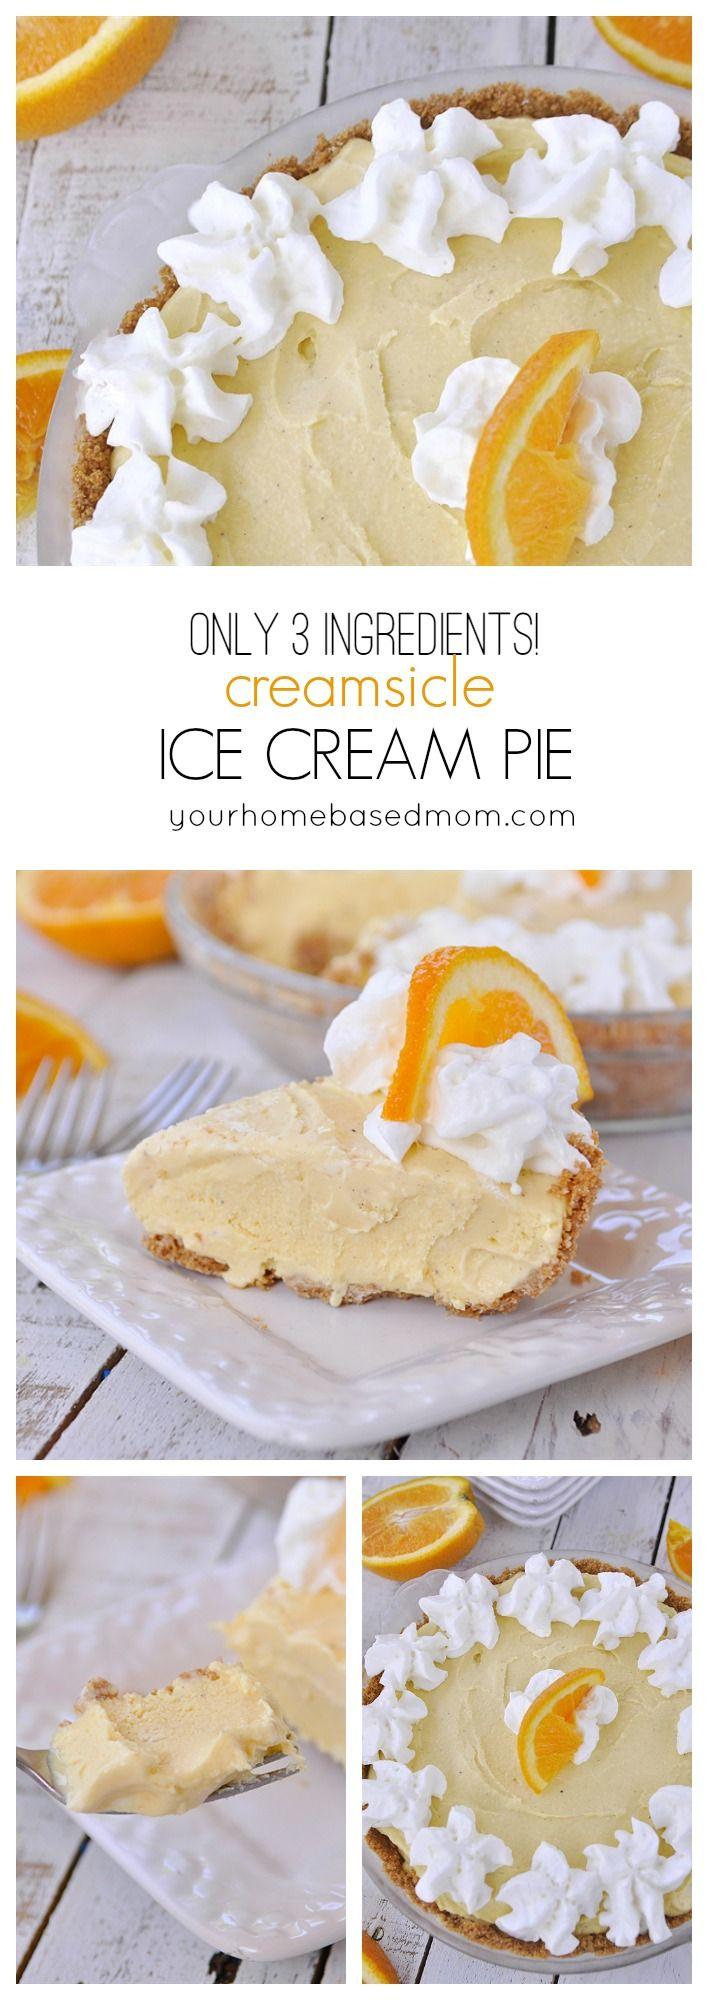 Creamsicle Ice Cream Pie has only 3 ingredients! Easy dessert recipe!